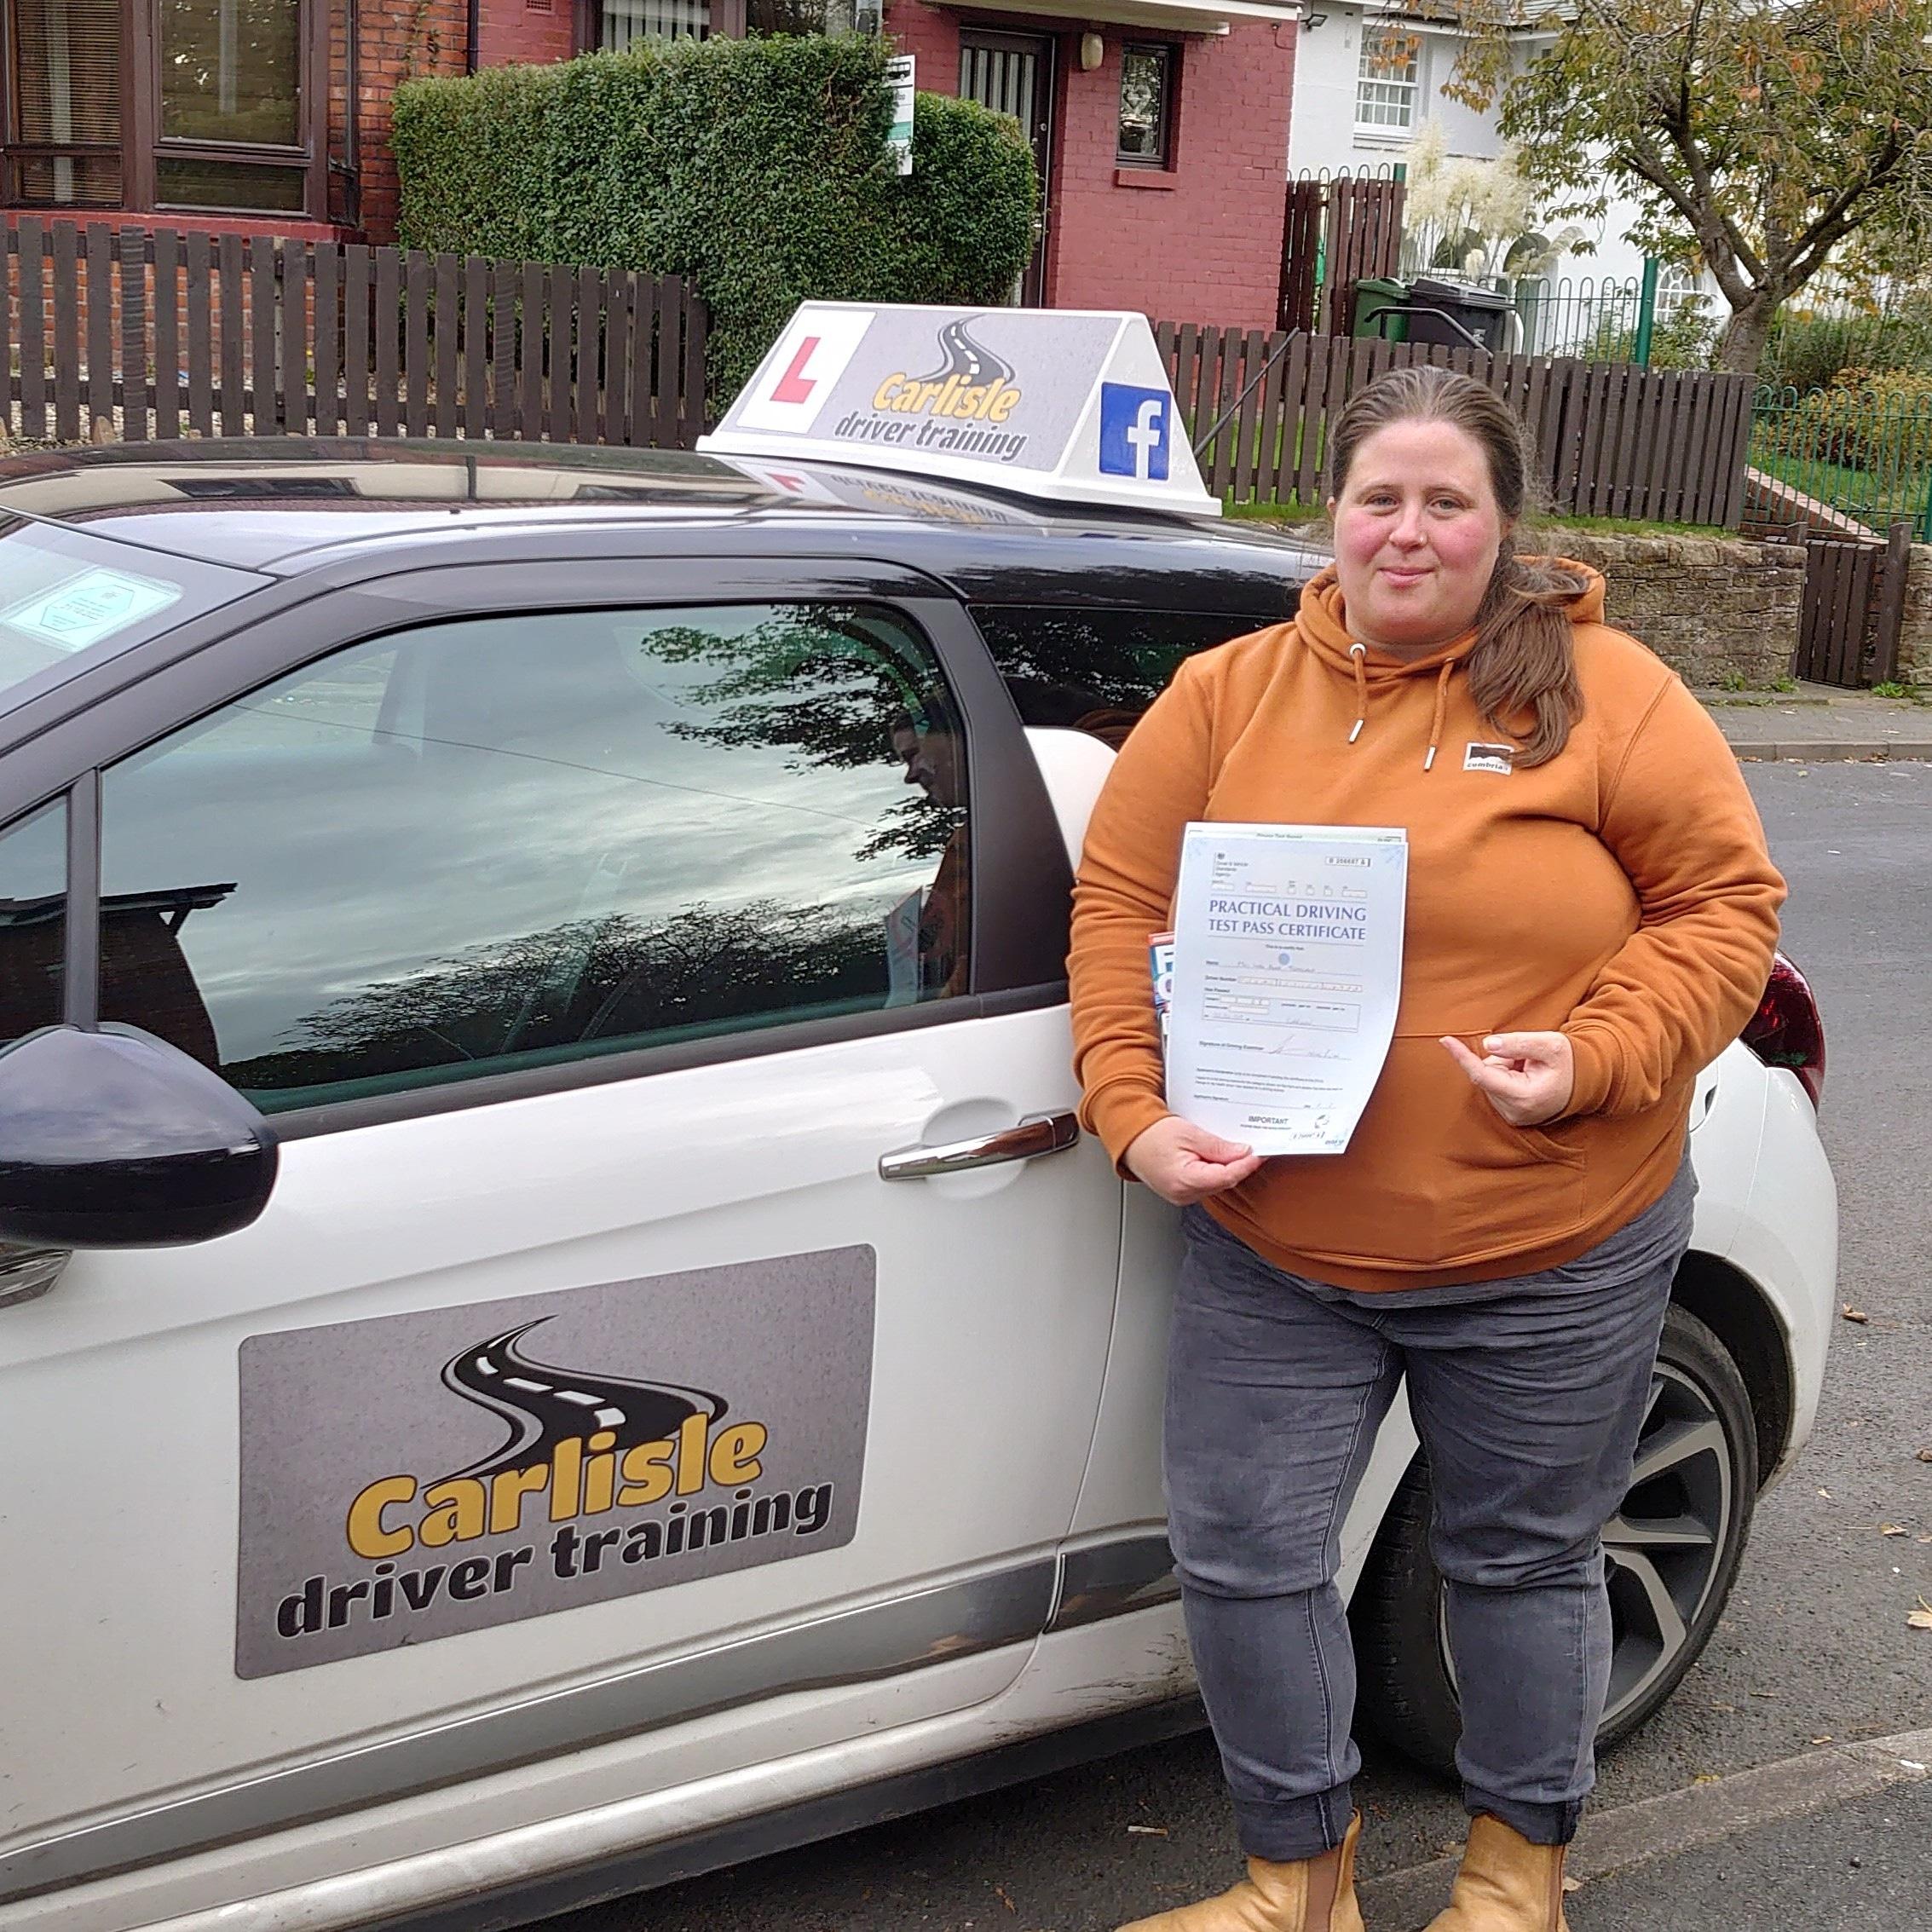 Leah Tjemsland passed driving test. Driving lessons in Carlisle. Driving instructor Carlisle. Driving school Carlisle.